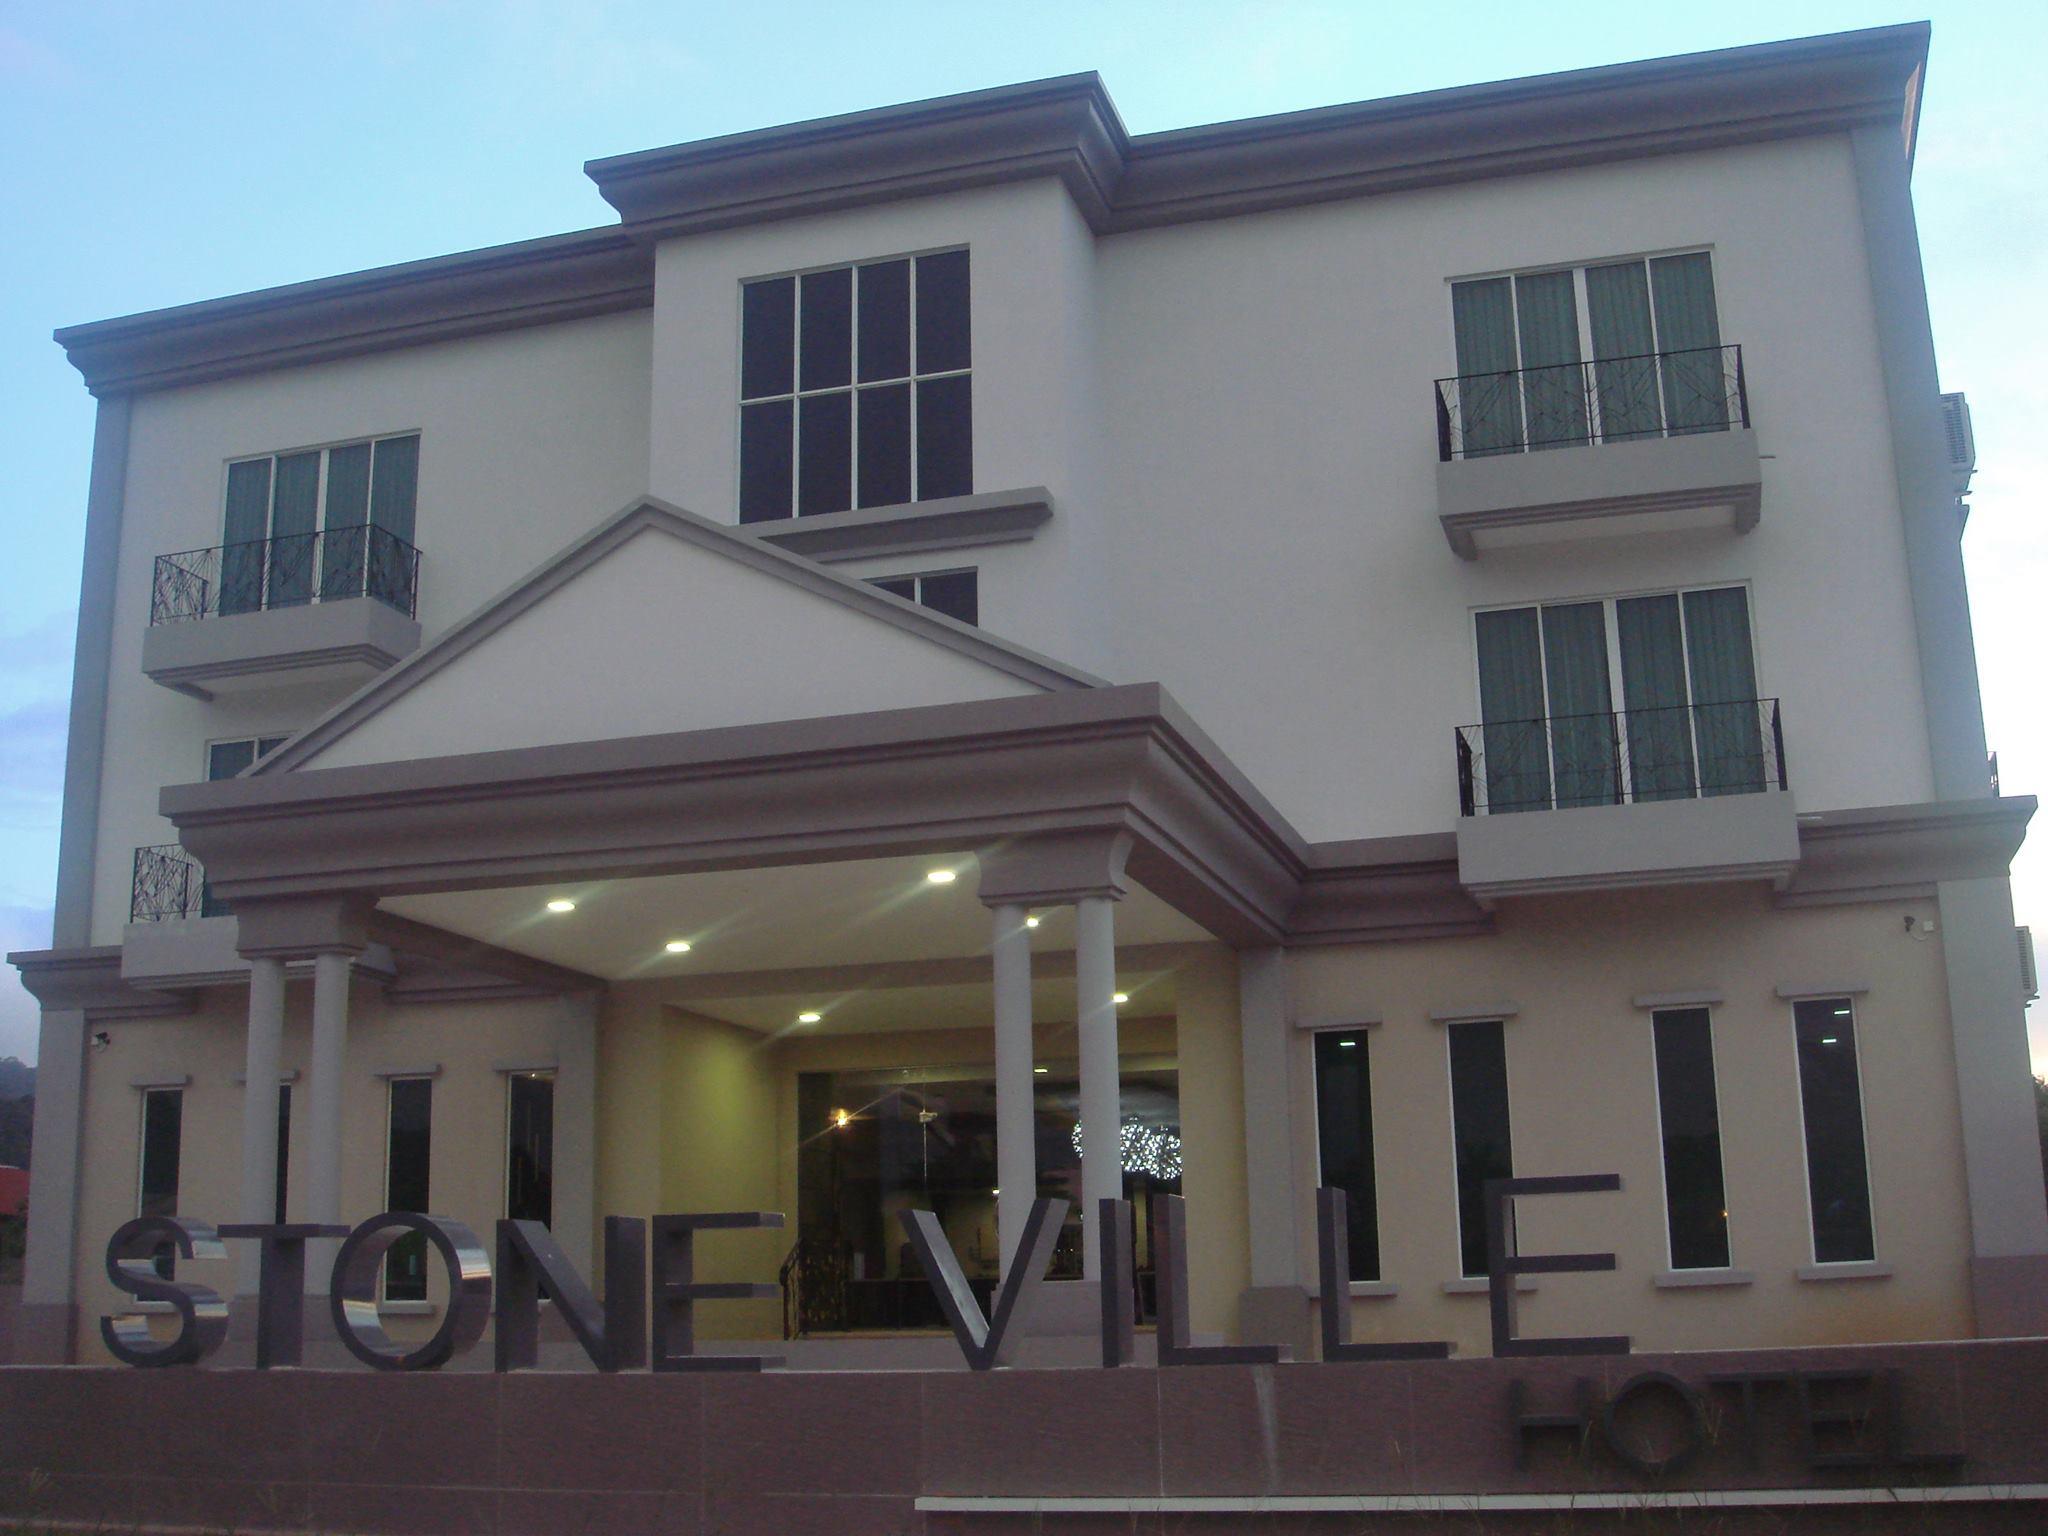 Stoneville Hotel Sdn Bhd